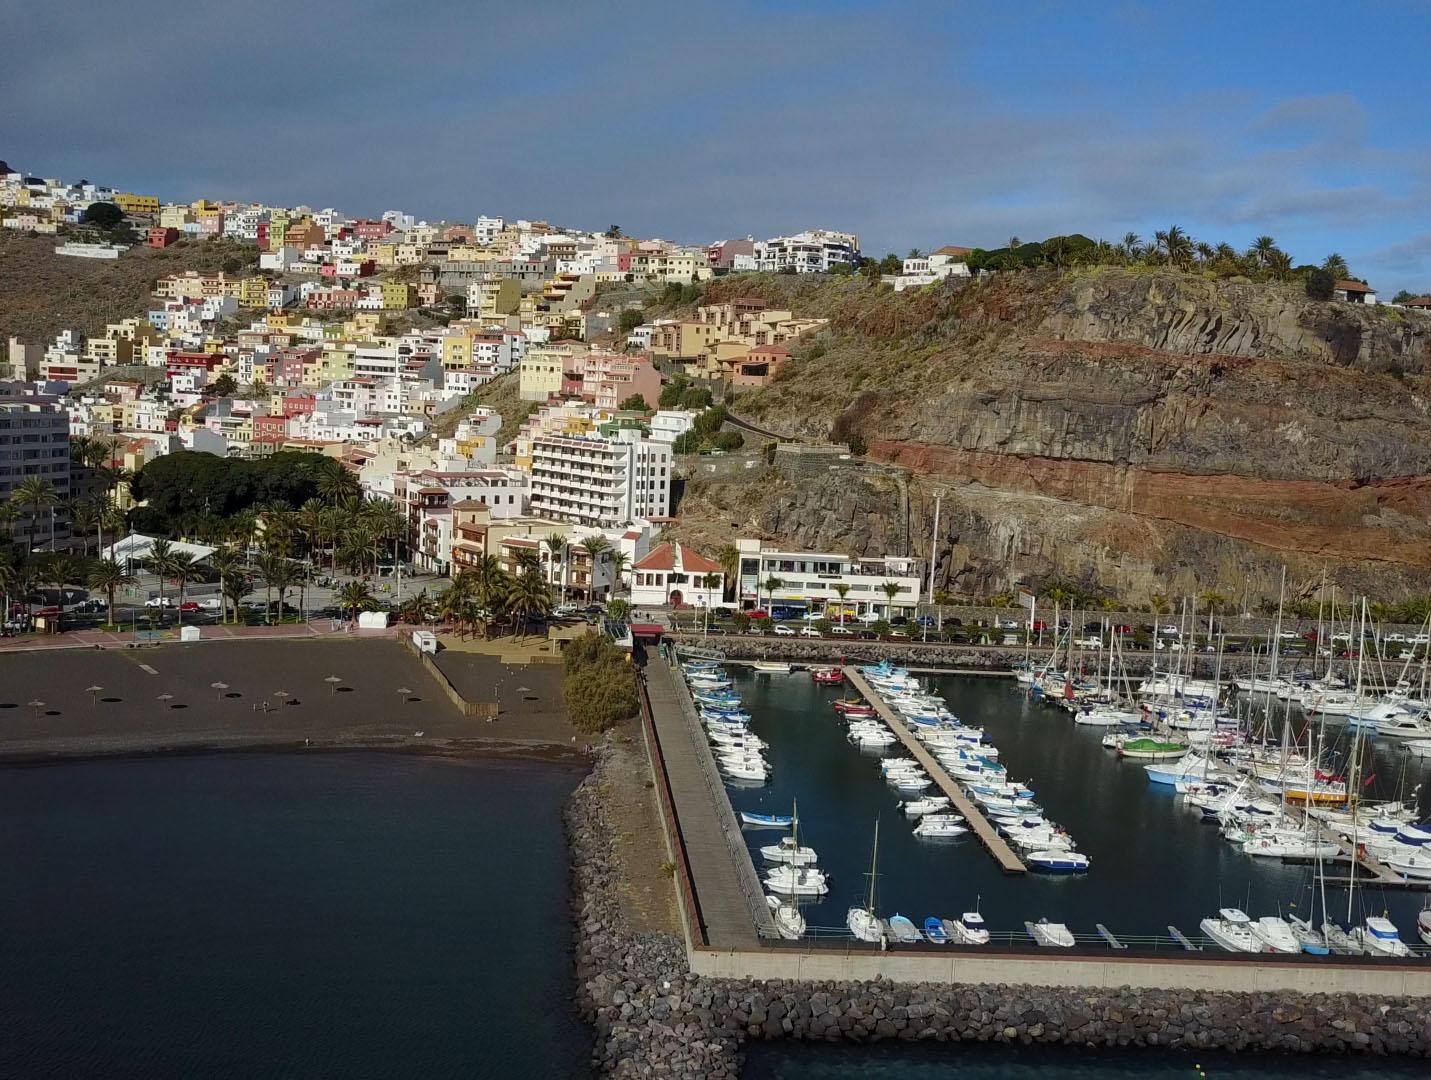 Marina La Gomera: Segelurlaub Zwischenstopp in San Sebastian - La Gomera